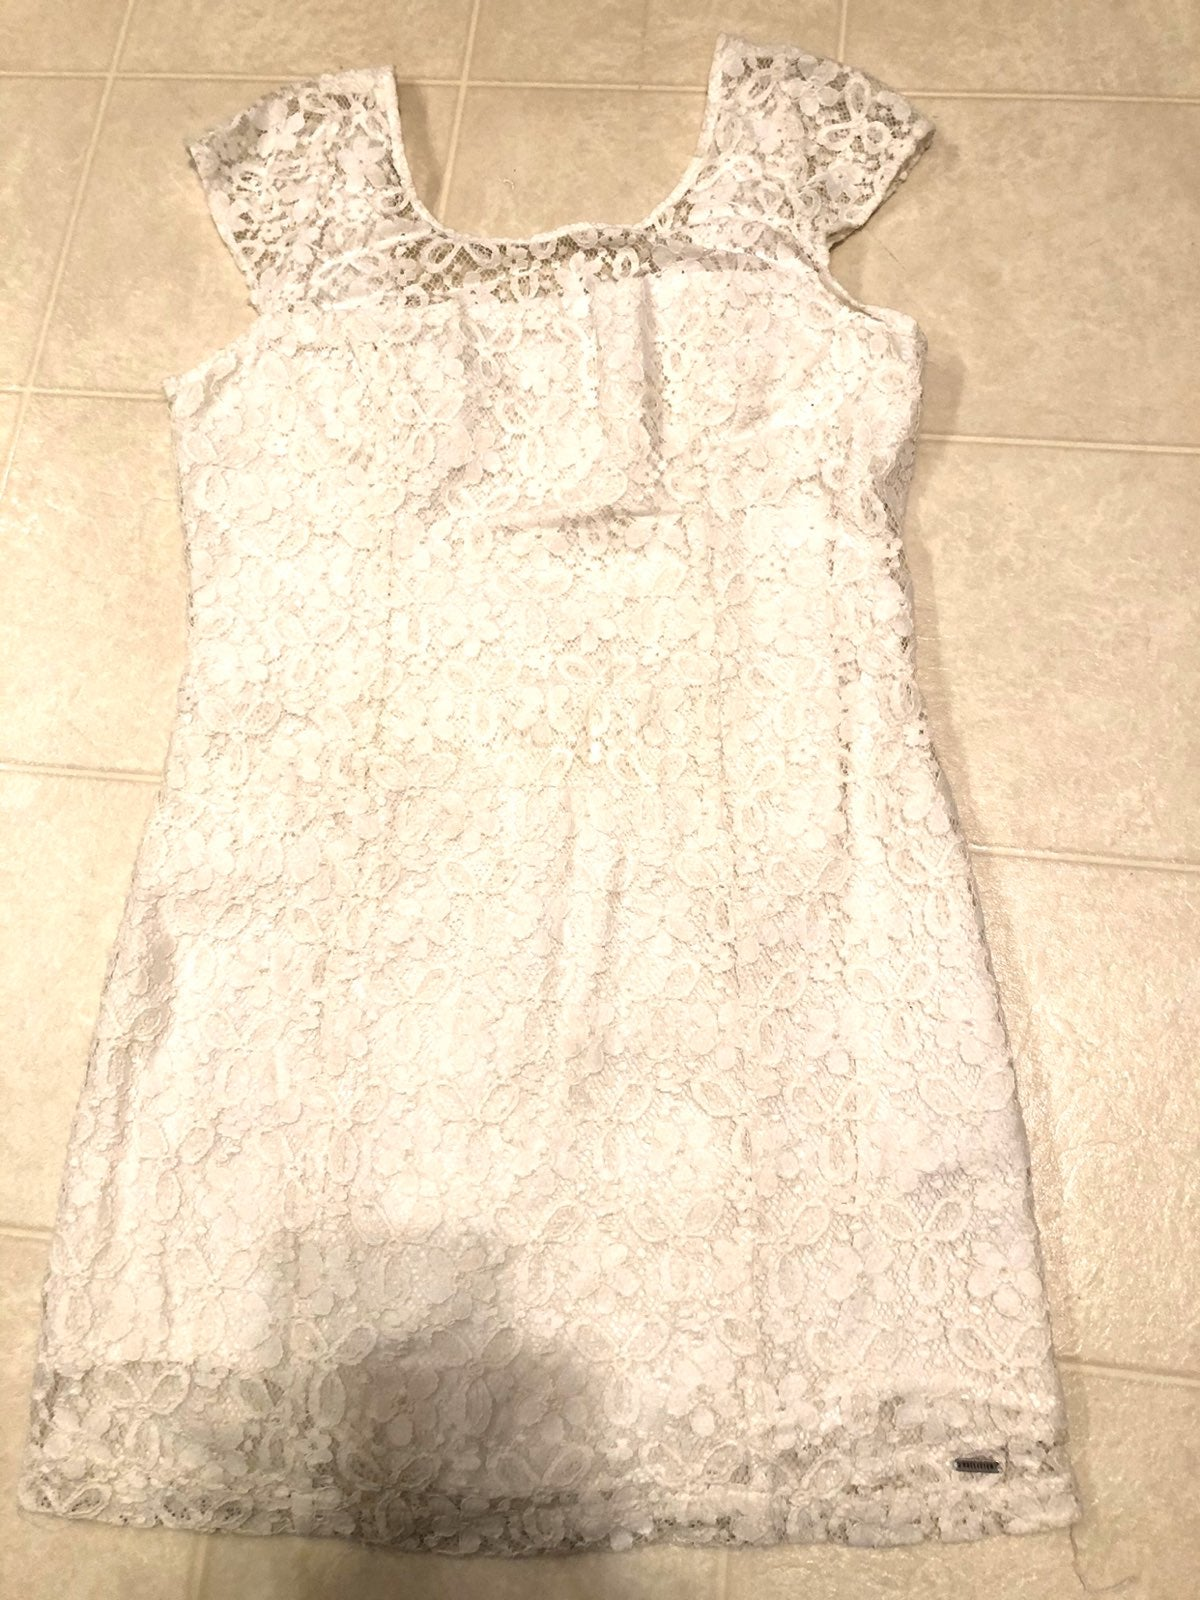 Hollister lace/crochet dress